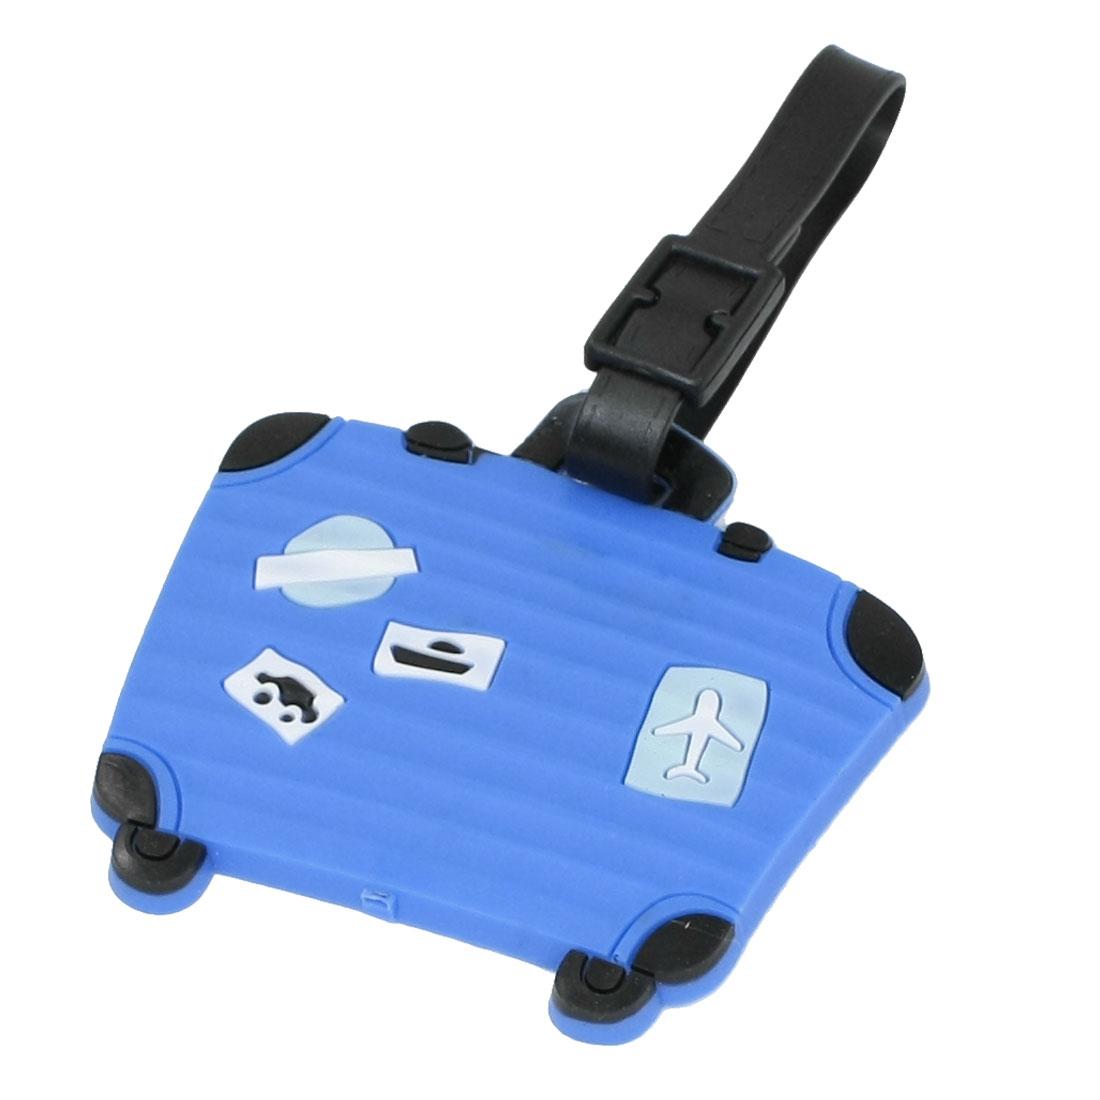 Blue Soft Plastic Luggage Shaped Name Address Label Travel Baggage Bag Tag